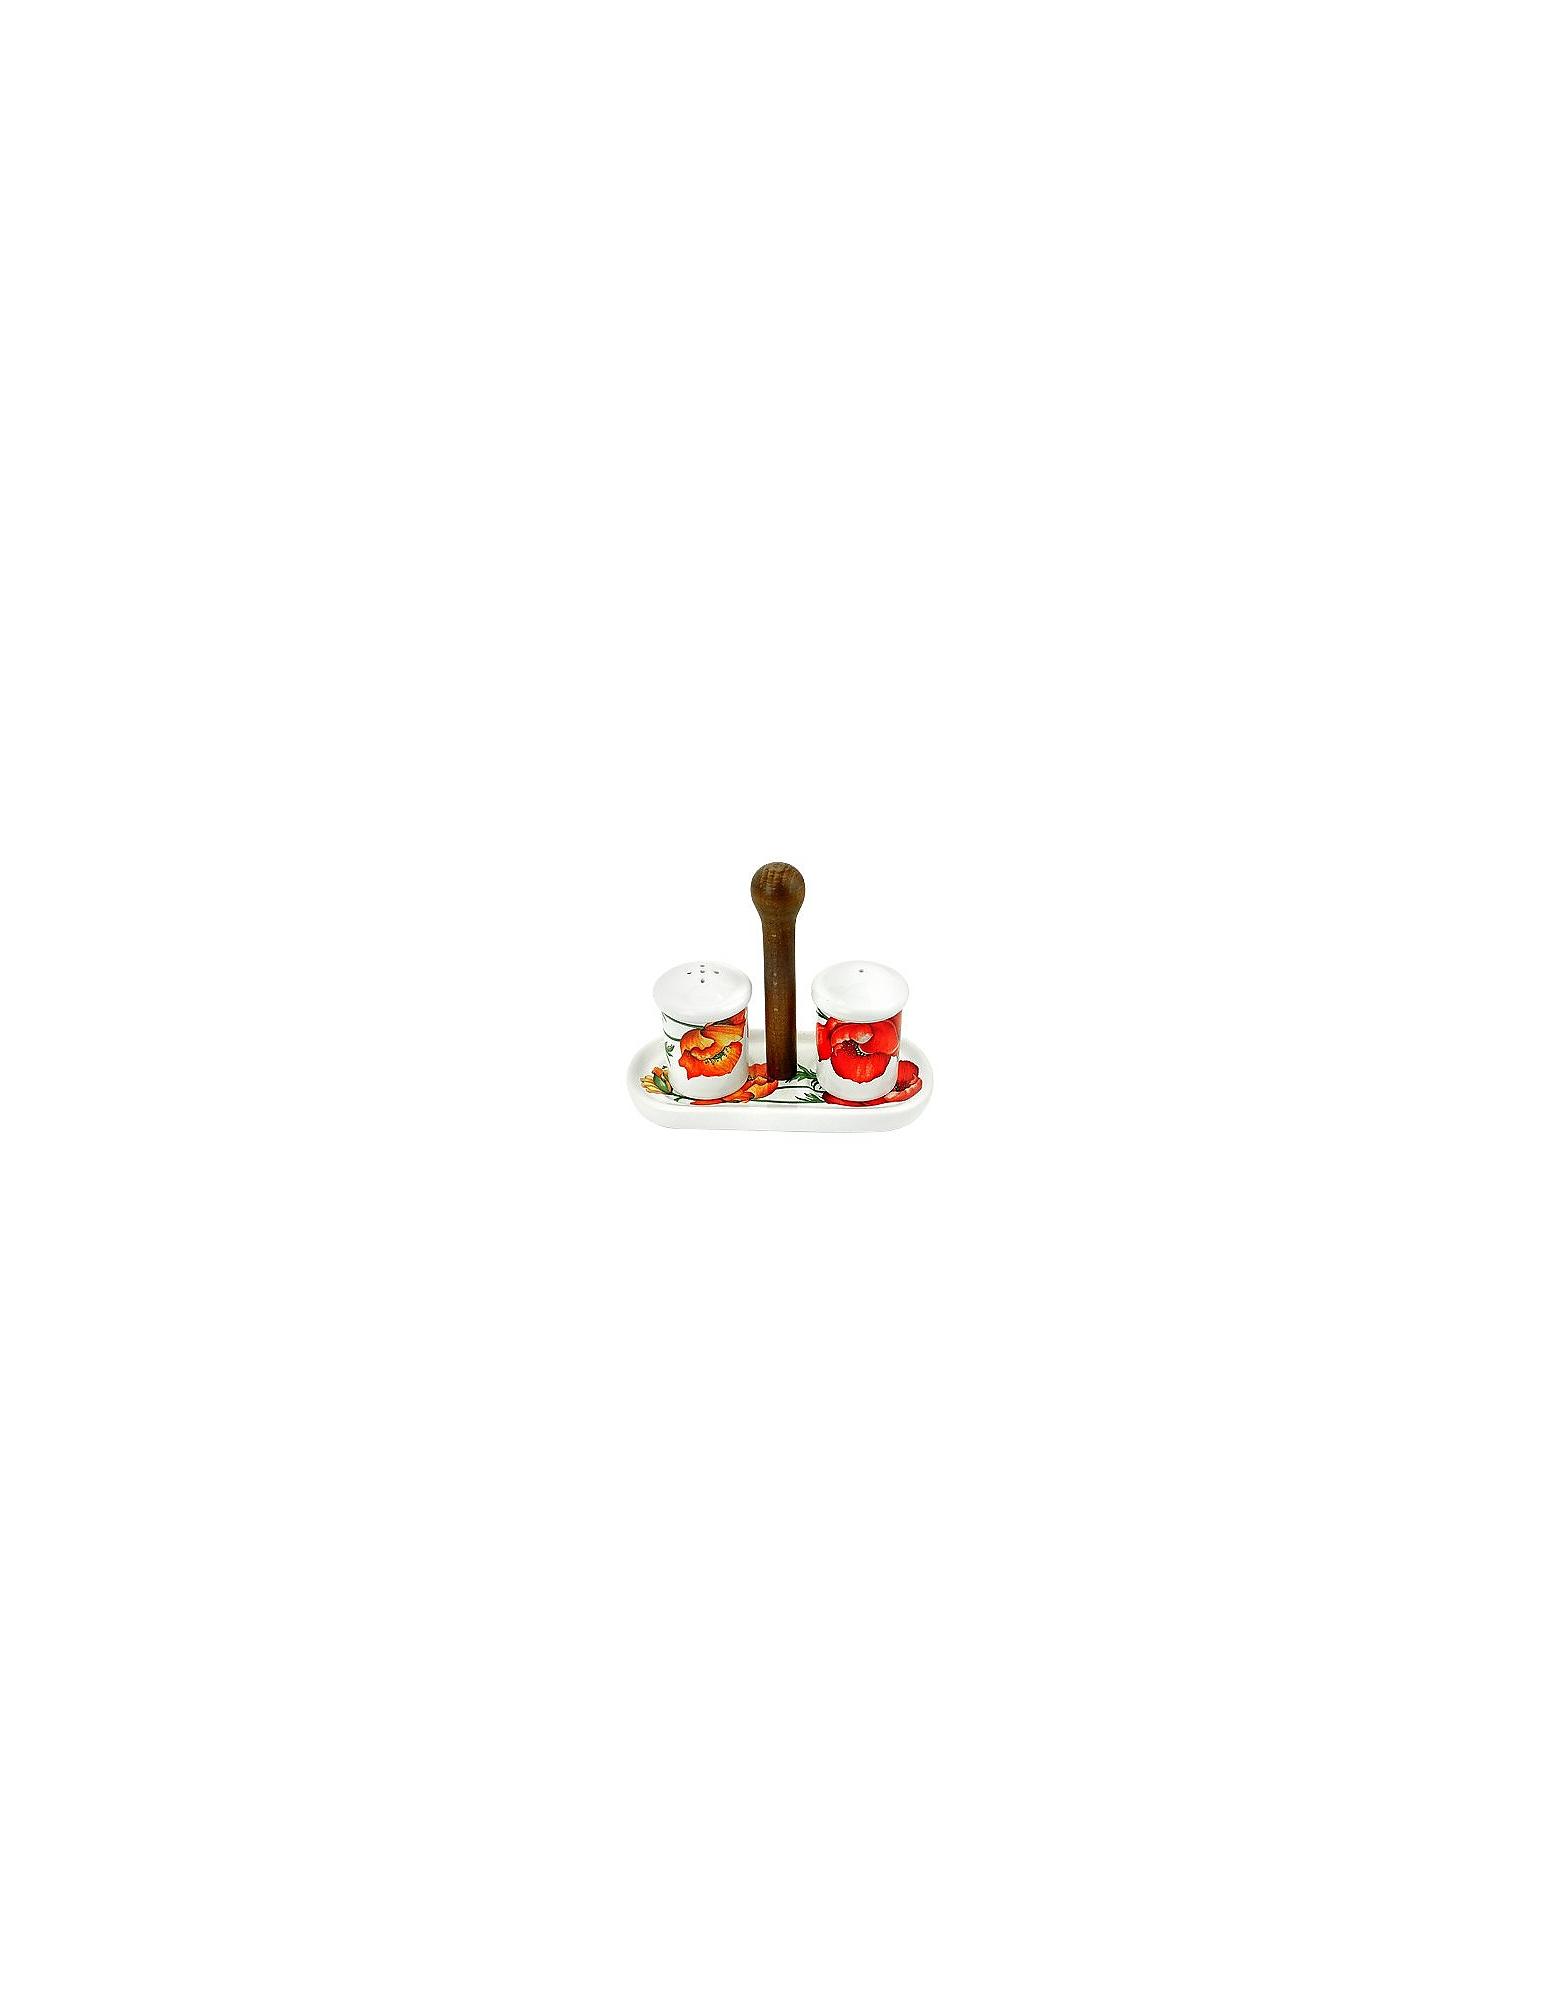 Image of Spigarelli Designer Kitchen & Dining, Poppy Ceramic Salt and Pepper Shaker w/Support